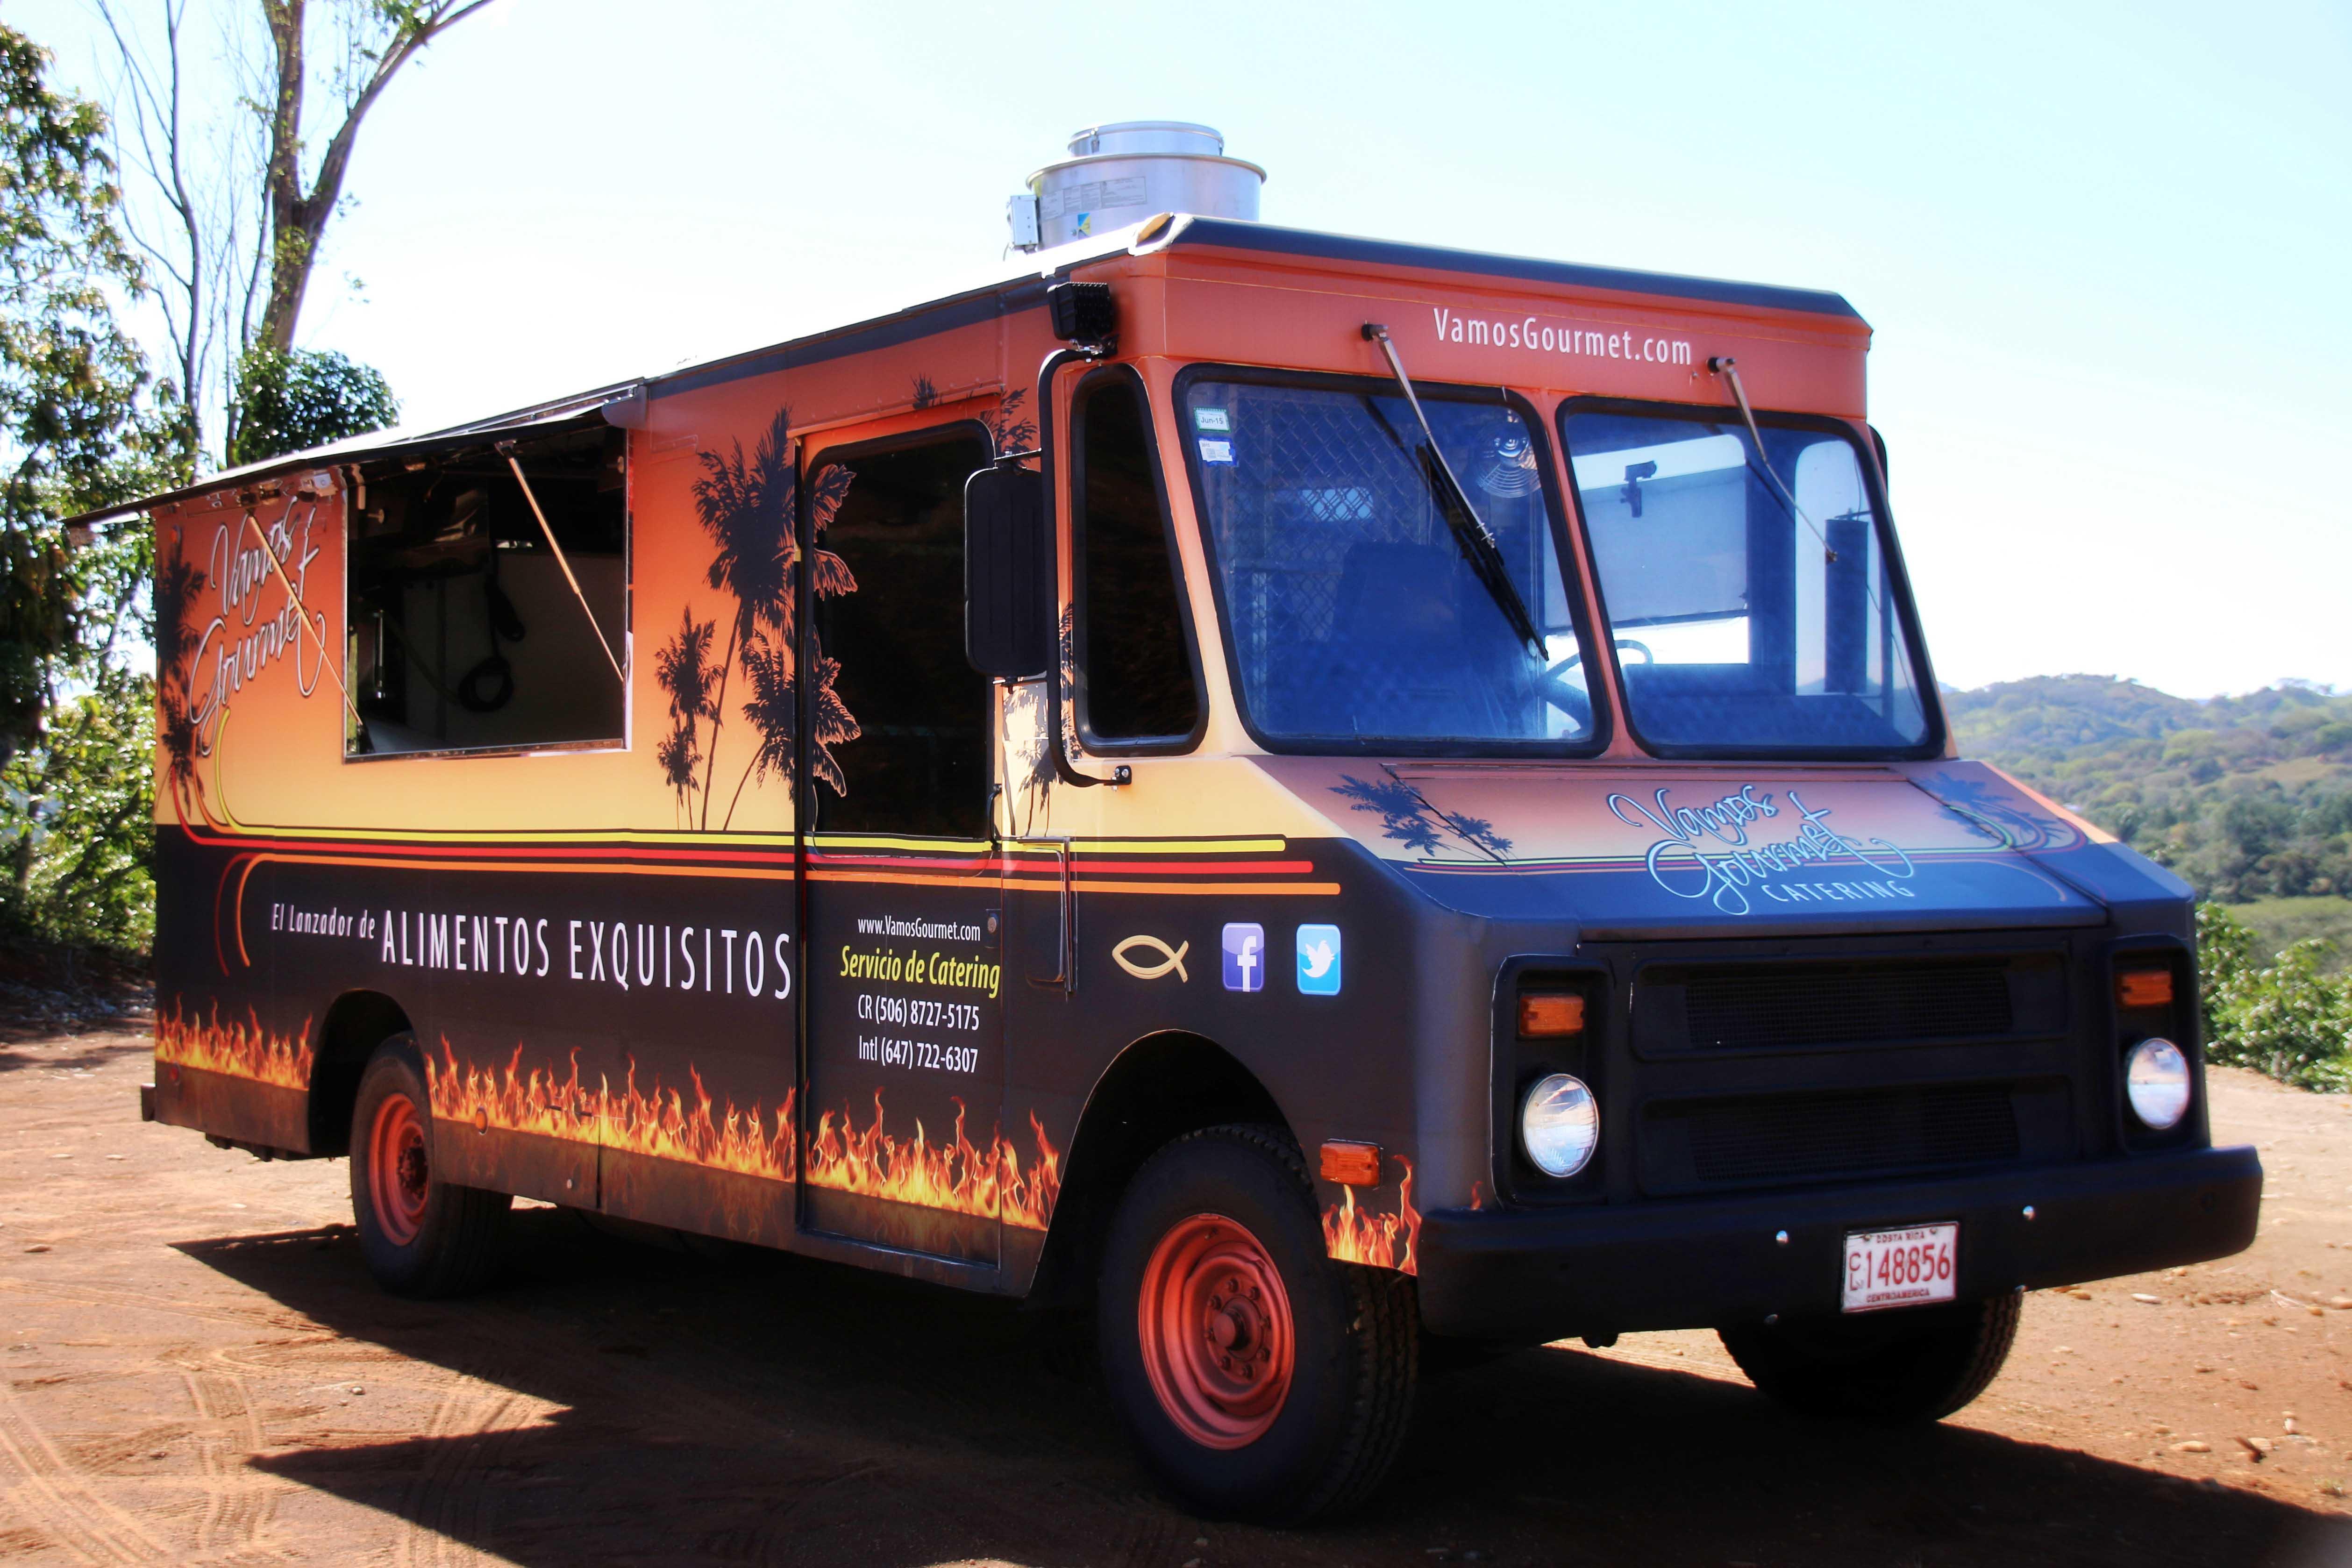 Vamos Gourmet Truck 07